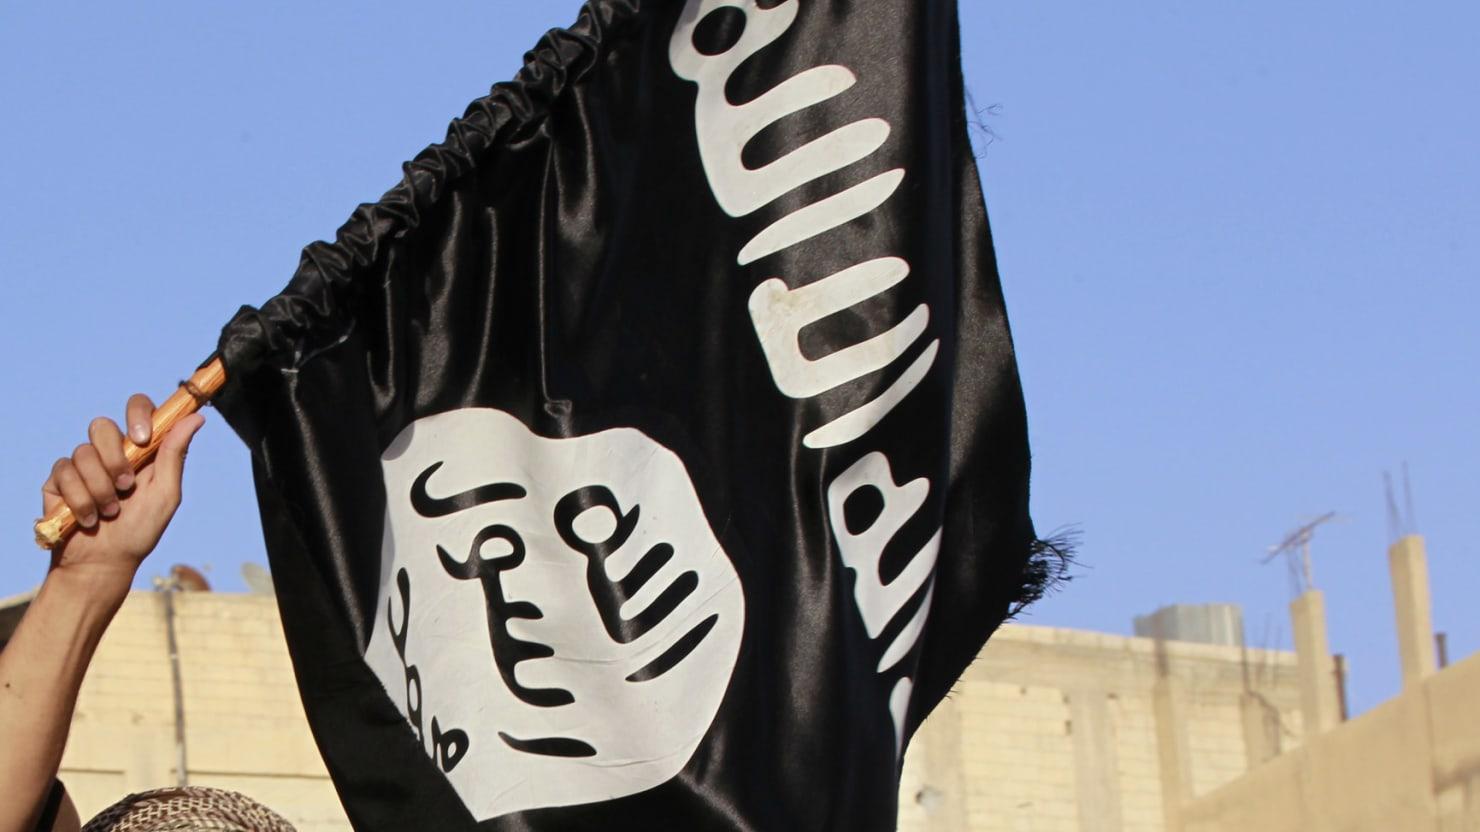 32 Dead After ISIS Militants Start Prison Riot in Tajikistan